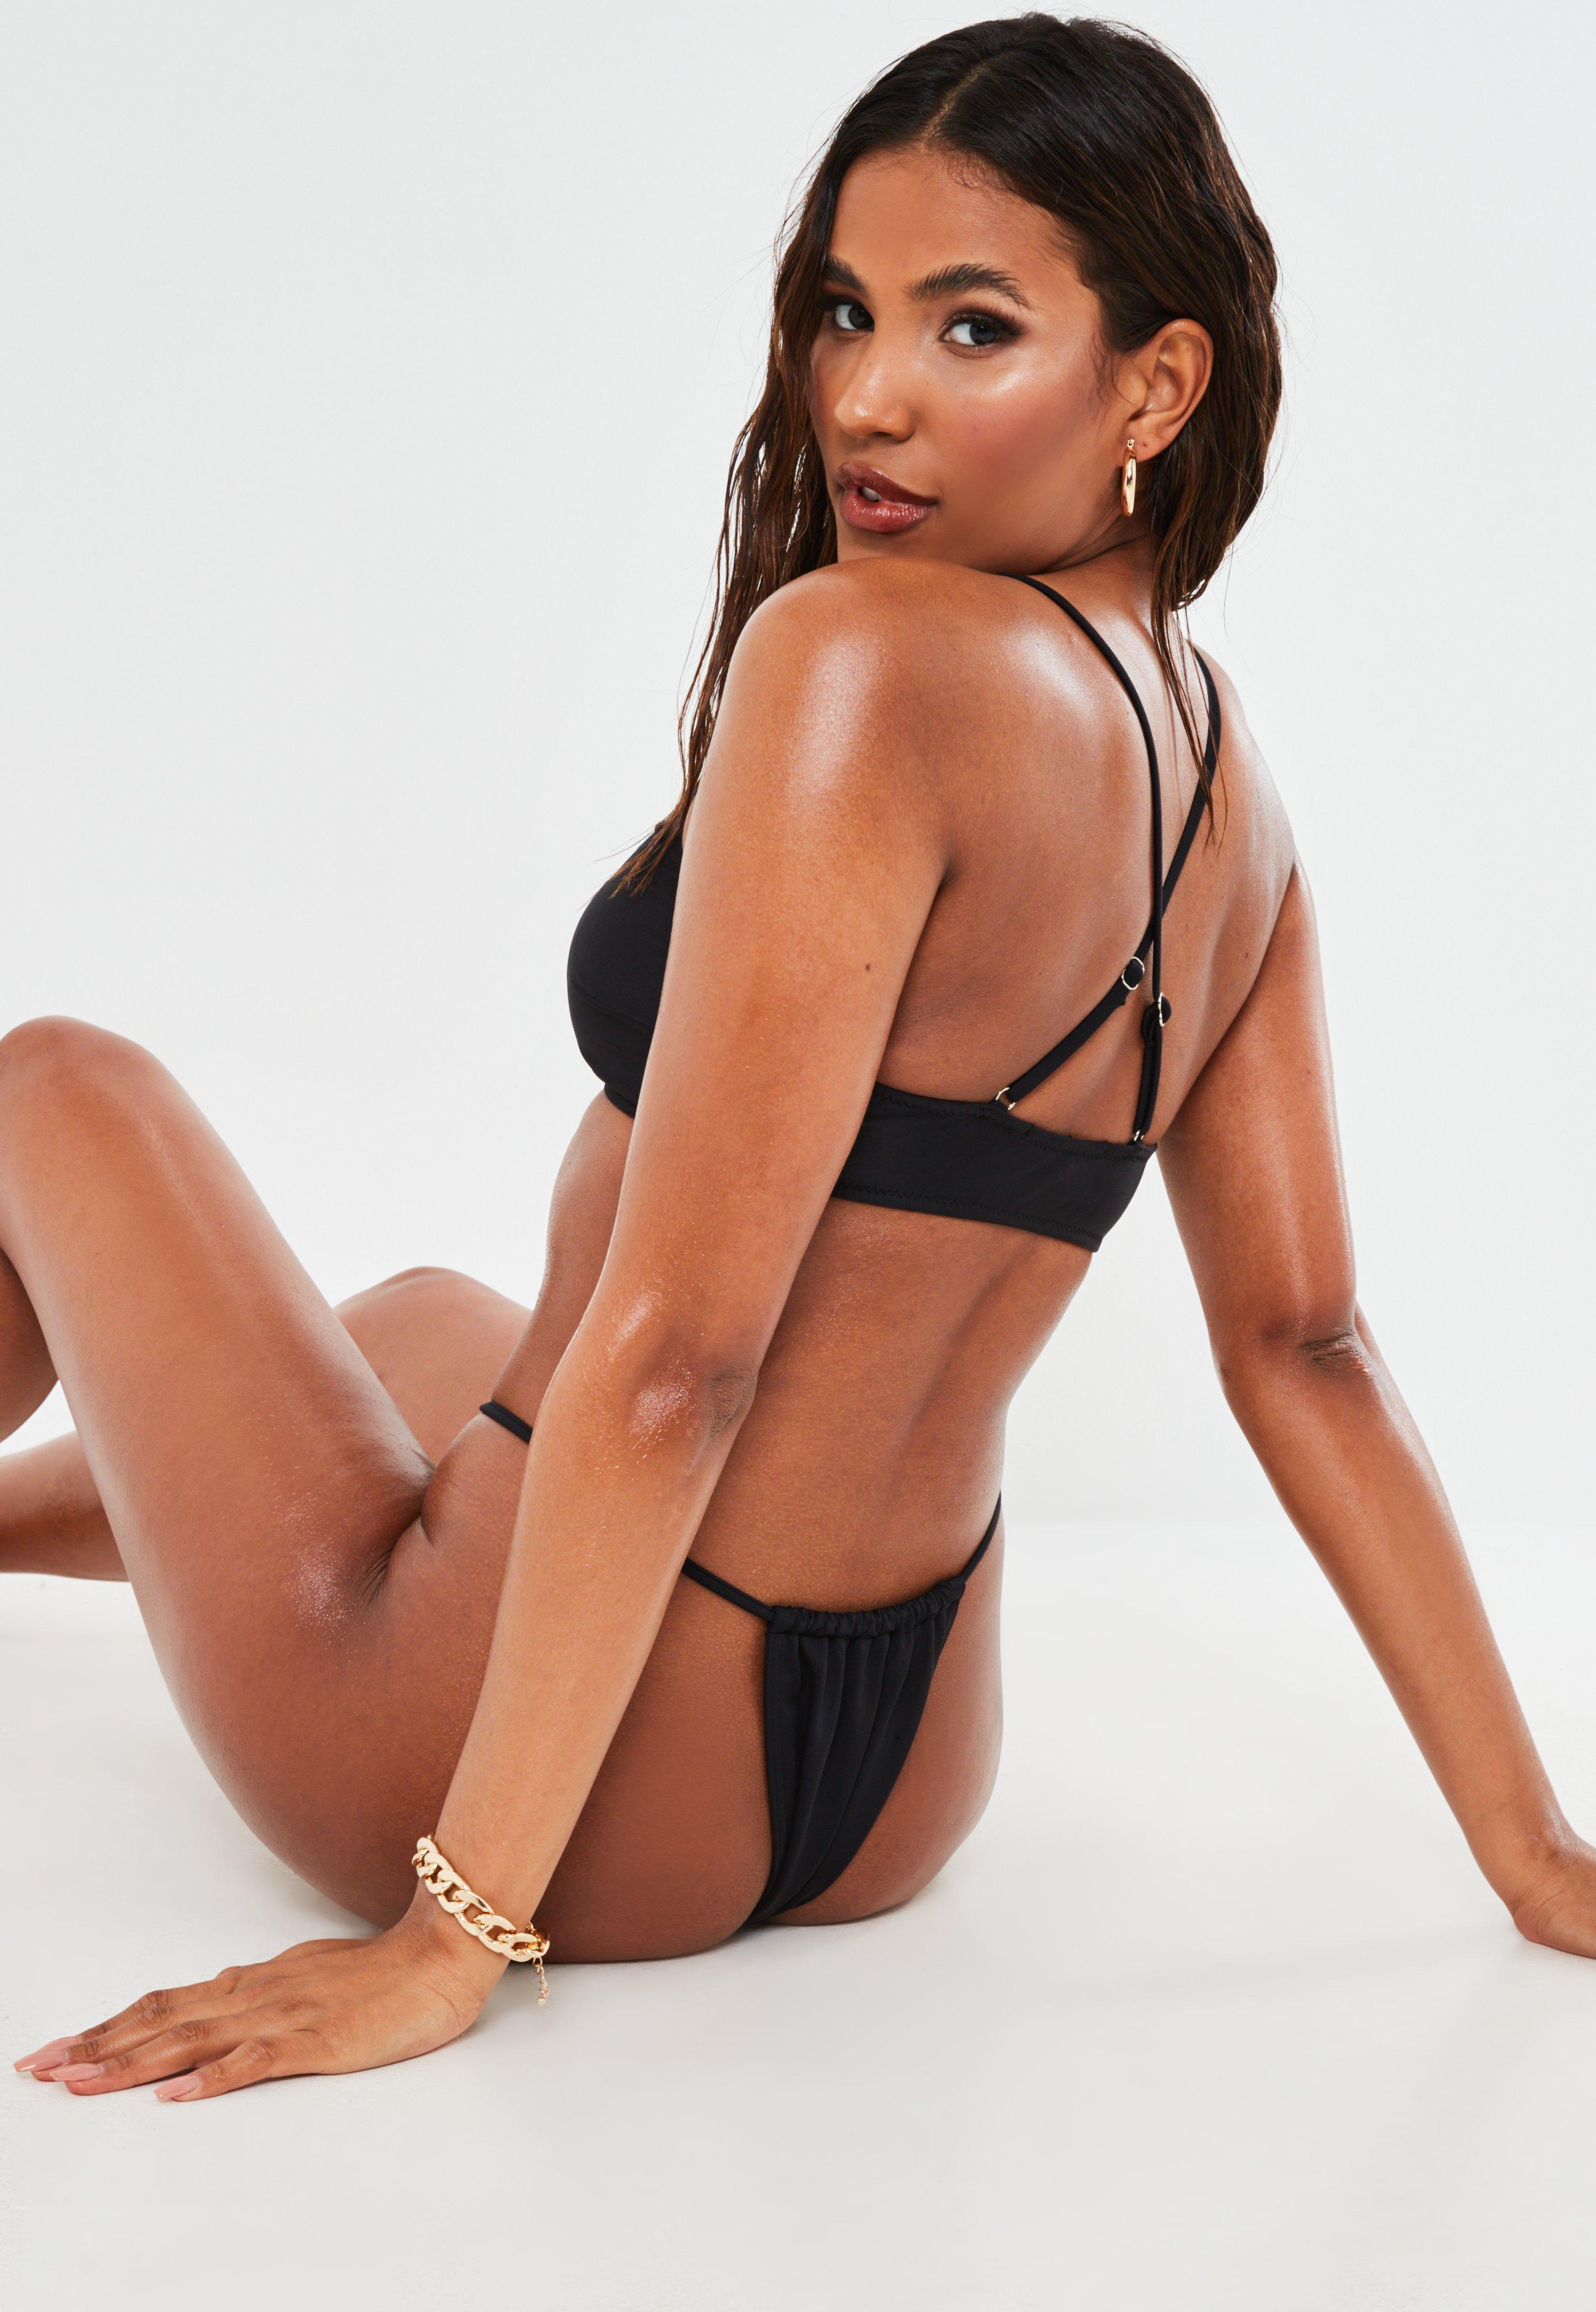 BikinisPush Longline Upamp; Upamp; Women's BikinisPush Missguided Women's Women's Longline Missguided BrCWdoex